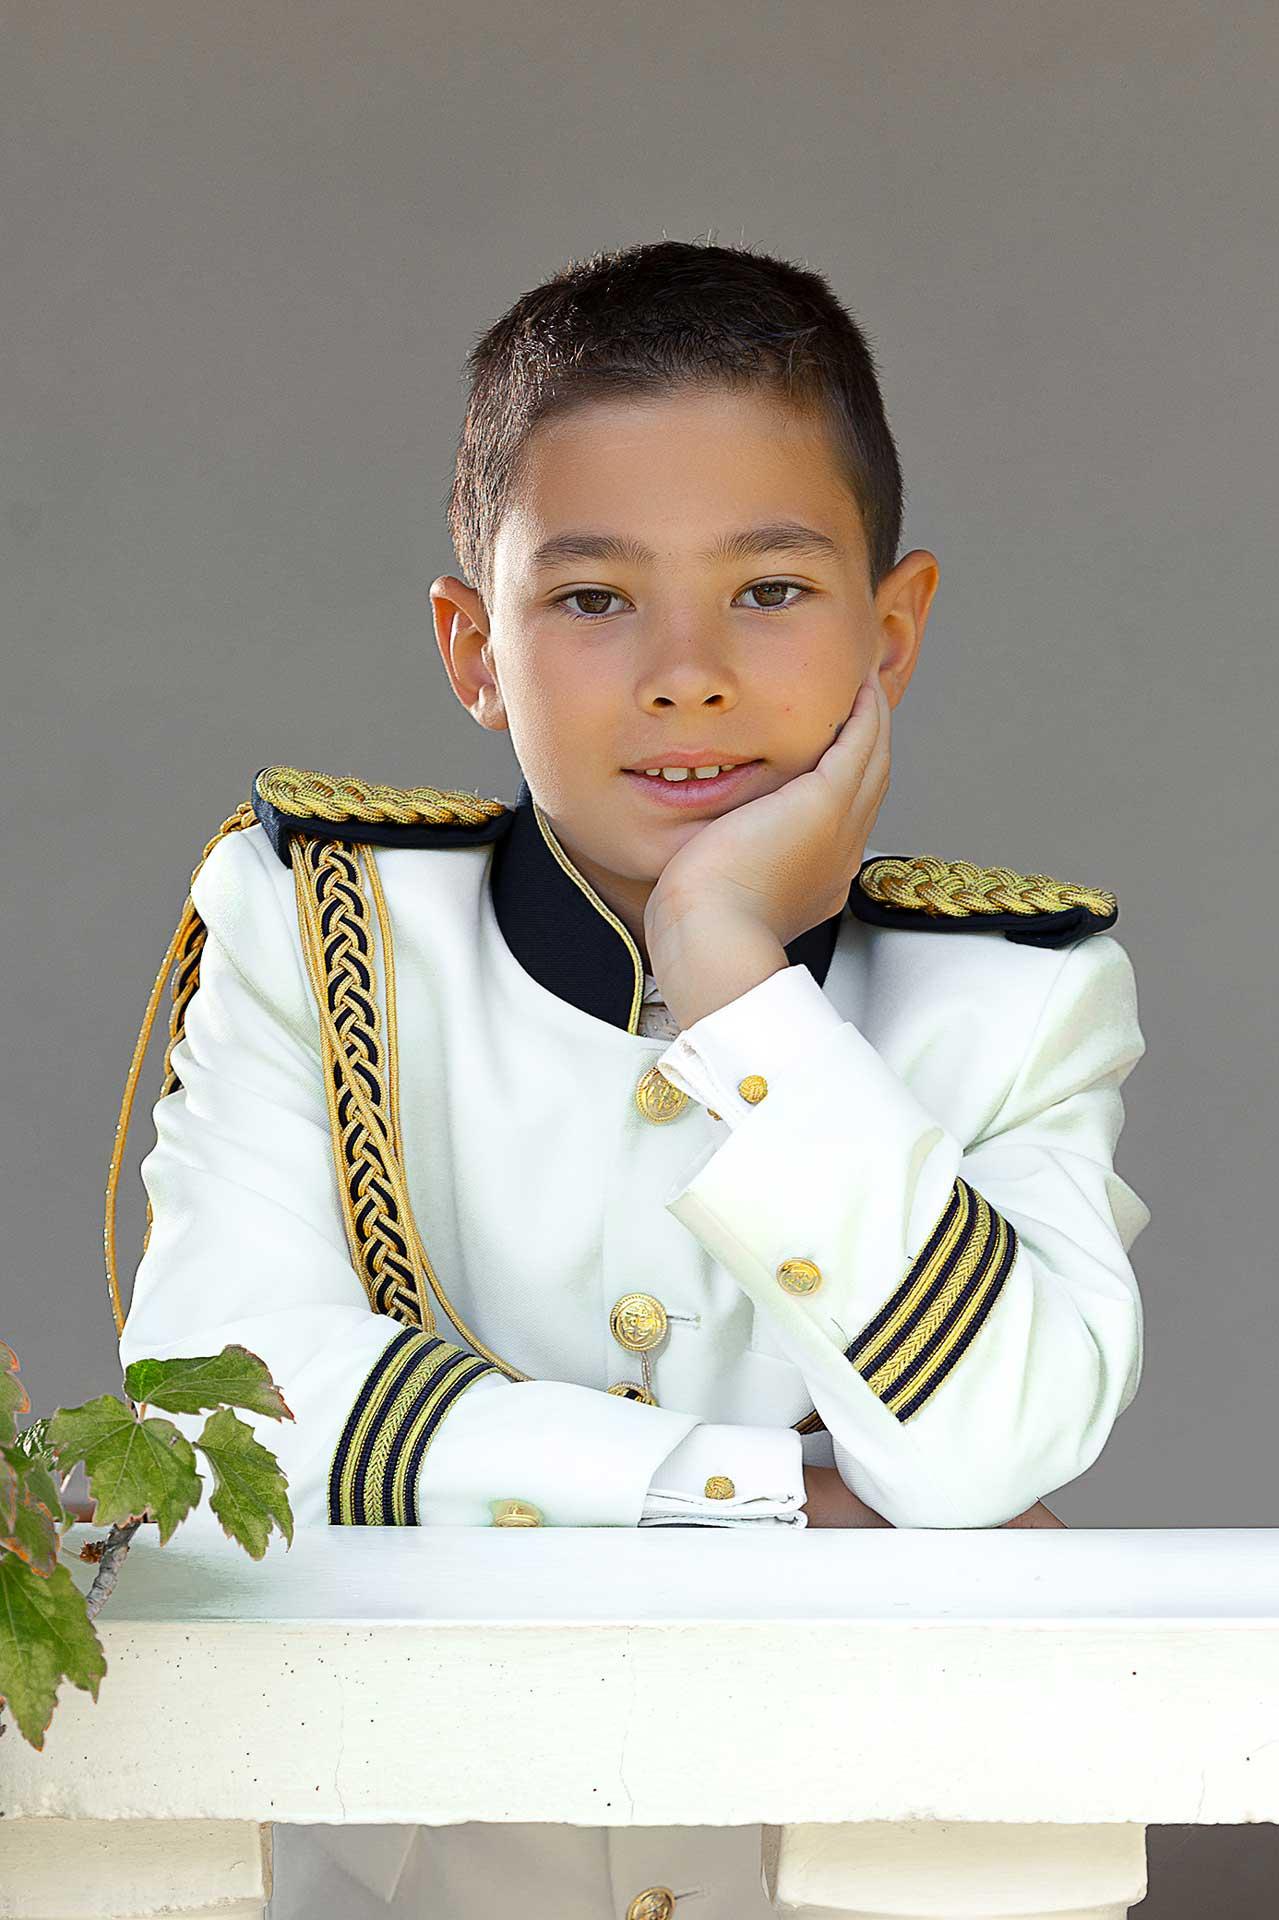 https://www.kidsphotography.es/wp-content/uploads/2021/05/Reportaje-de-Comunion-Adrian-0313-©-Kids-Photography.jpg